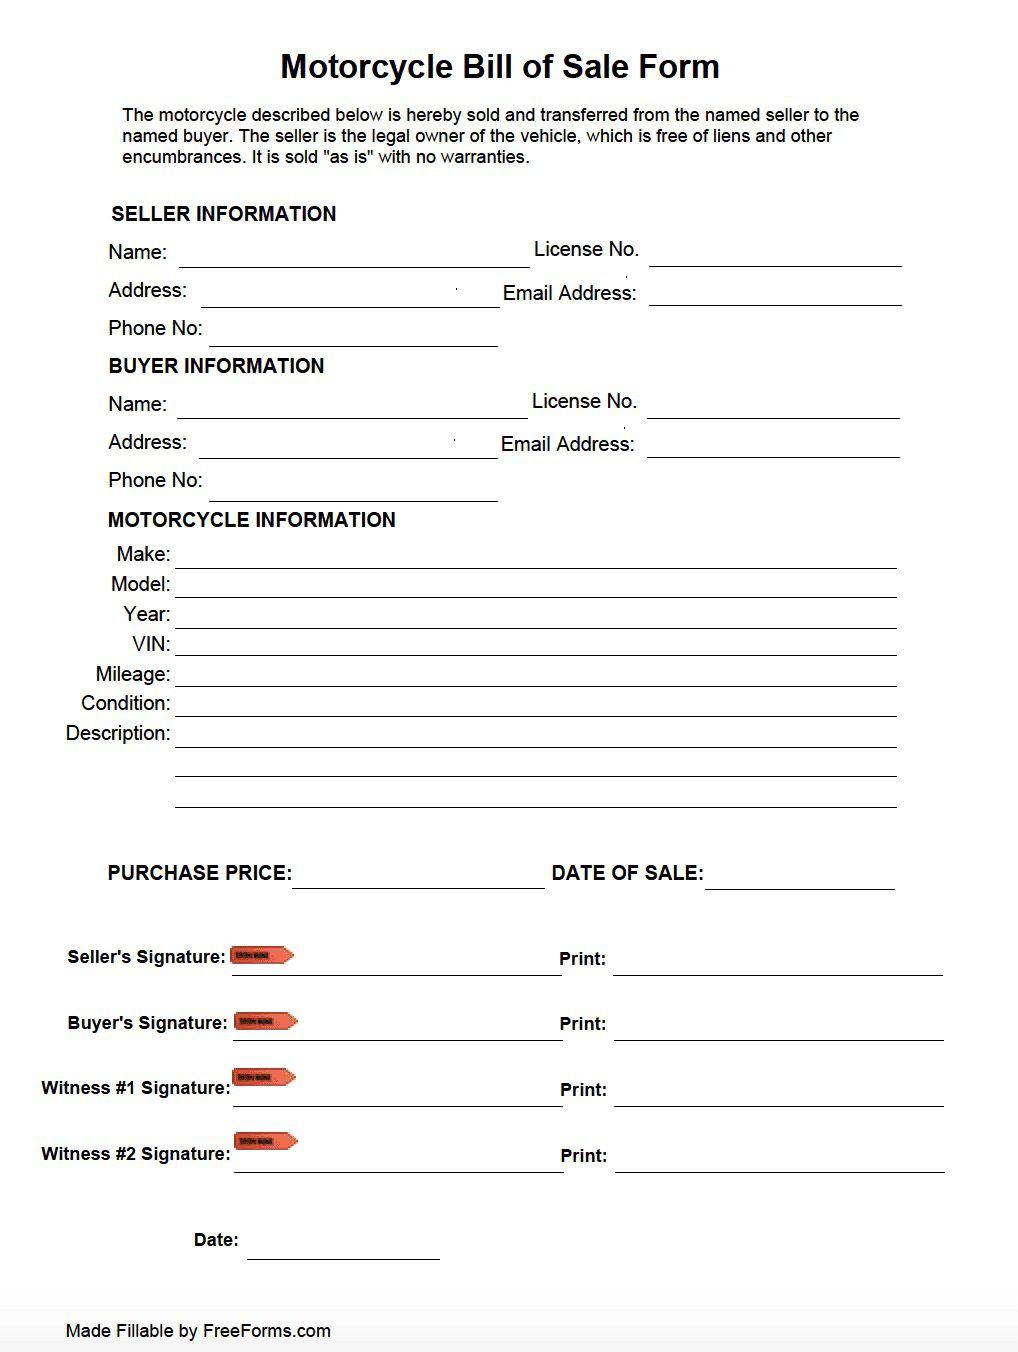 006 Incredible Motorcycle Bill Of Sale Template Image  Ontario Printable Word CaliforniaFull